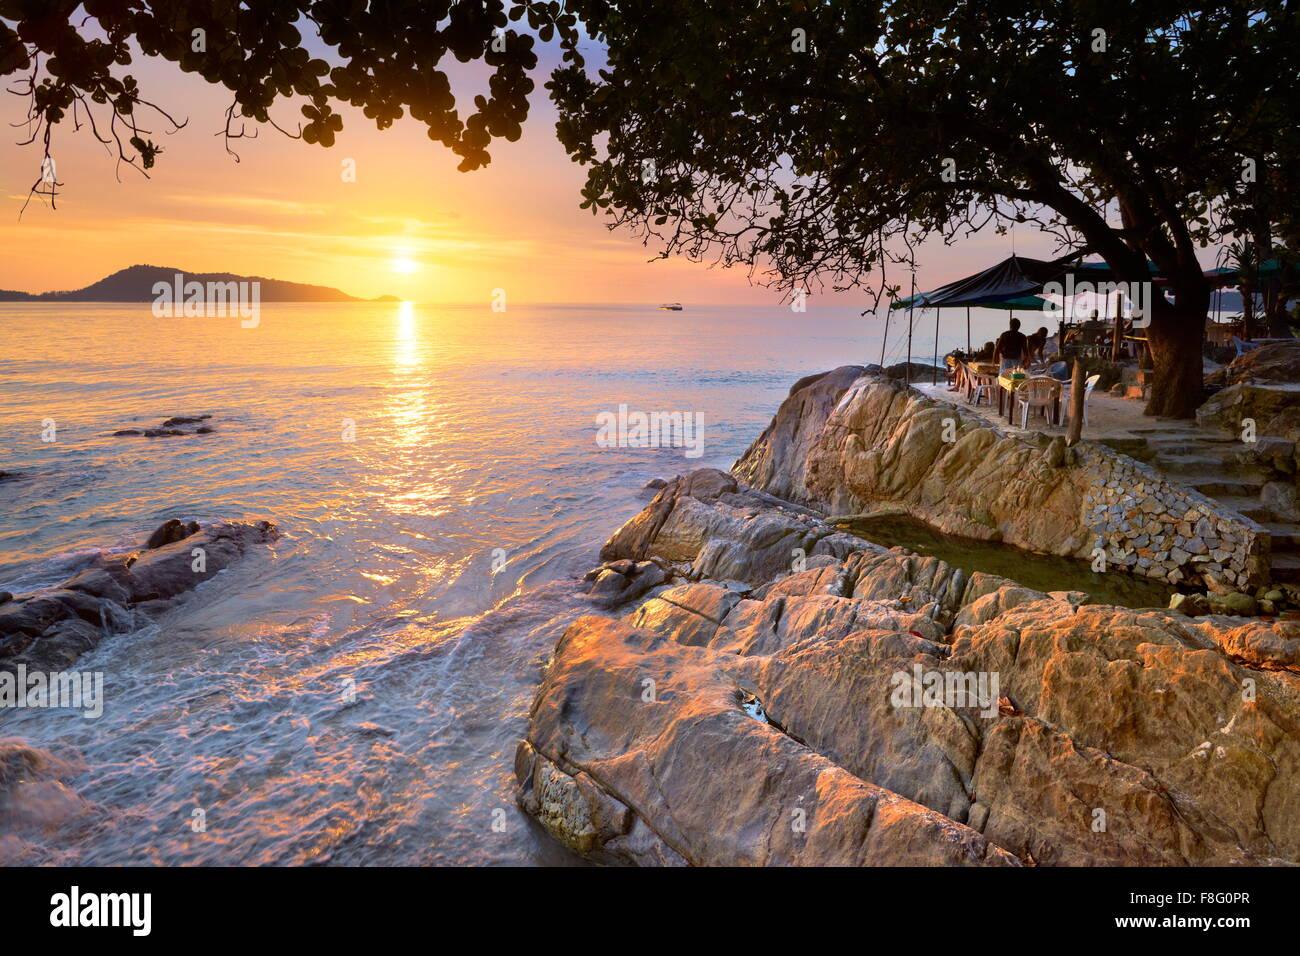 Thailand - Insel Phuket, Patong Beach, Sonnenuntergang Landschaft Stockbild